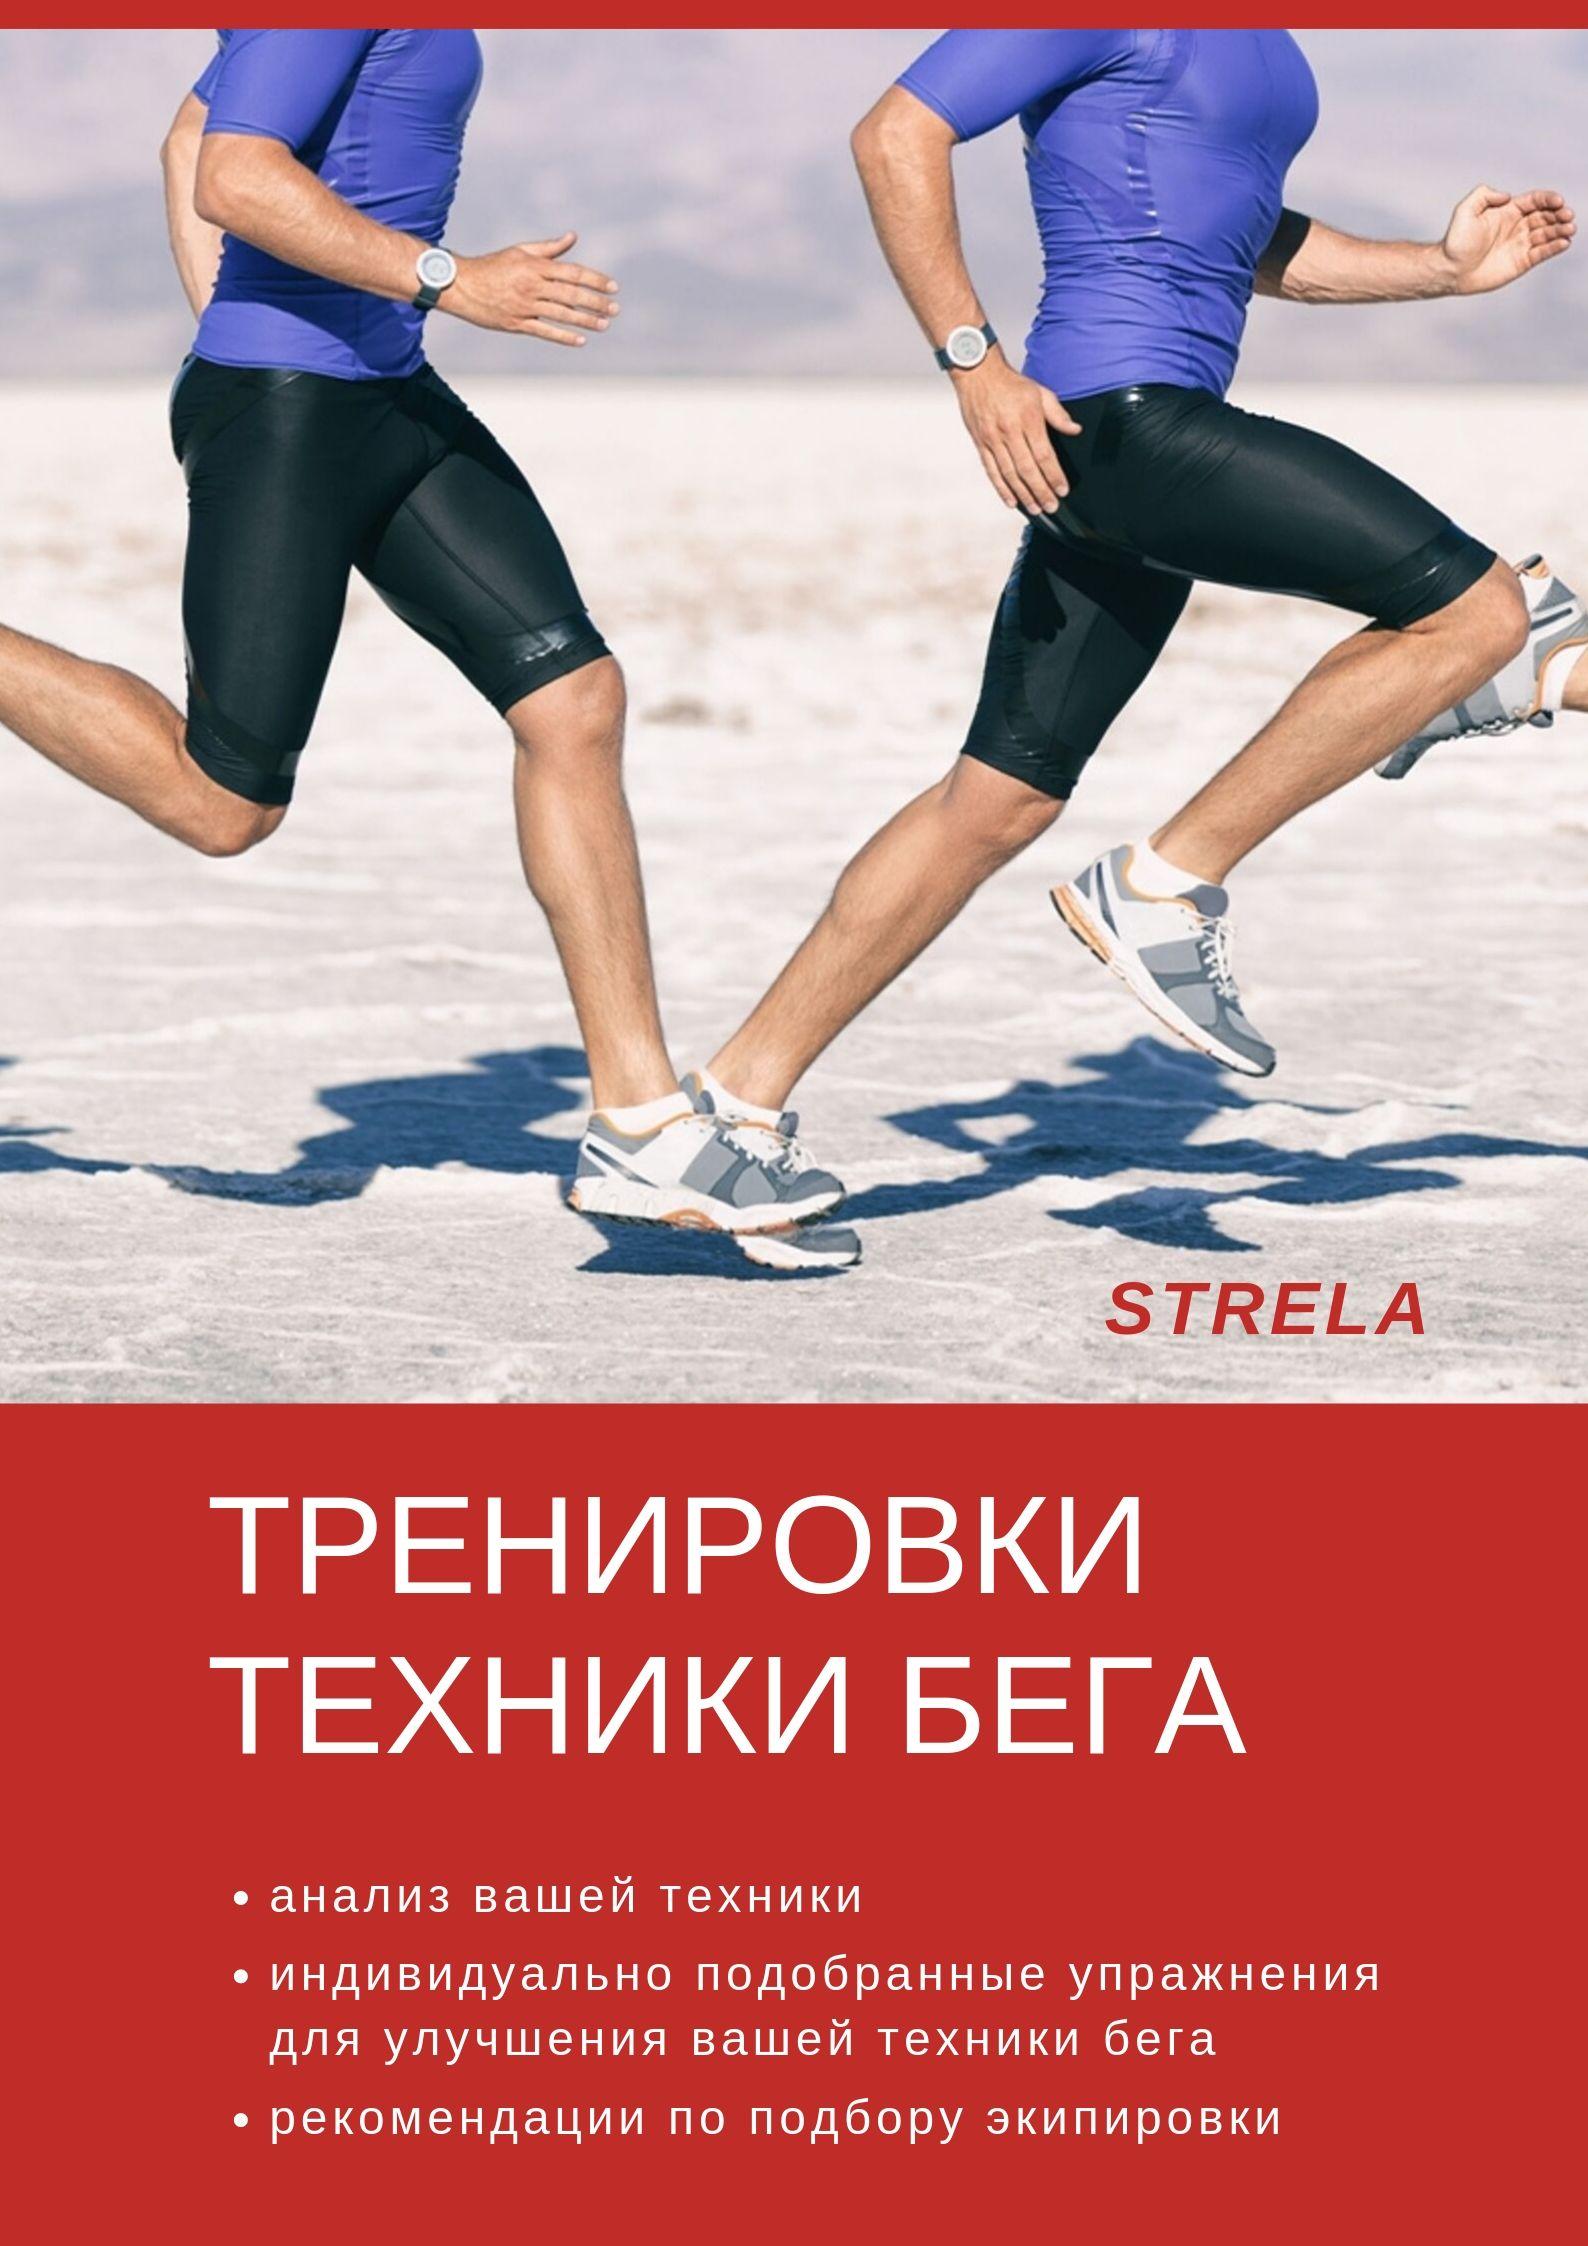 тренировки техники бега